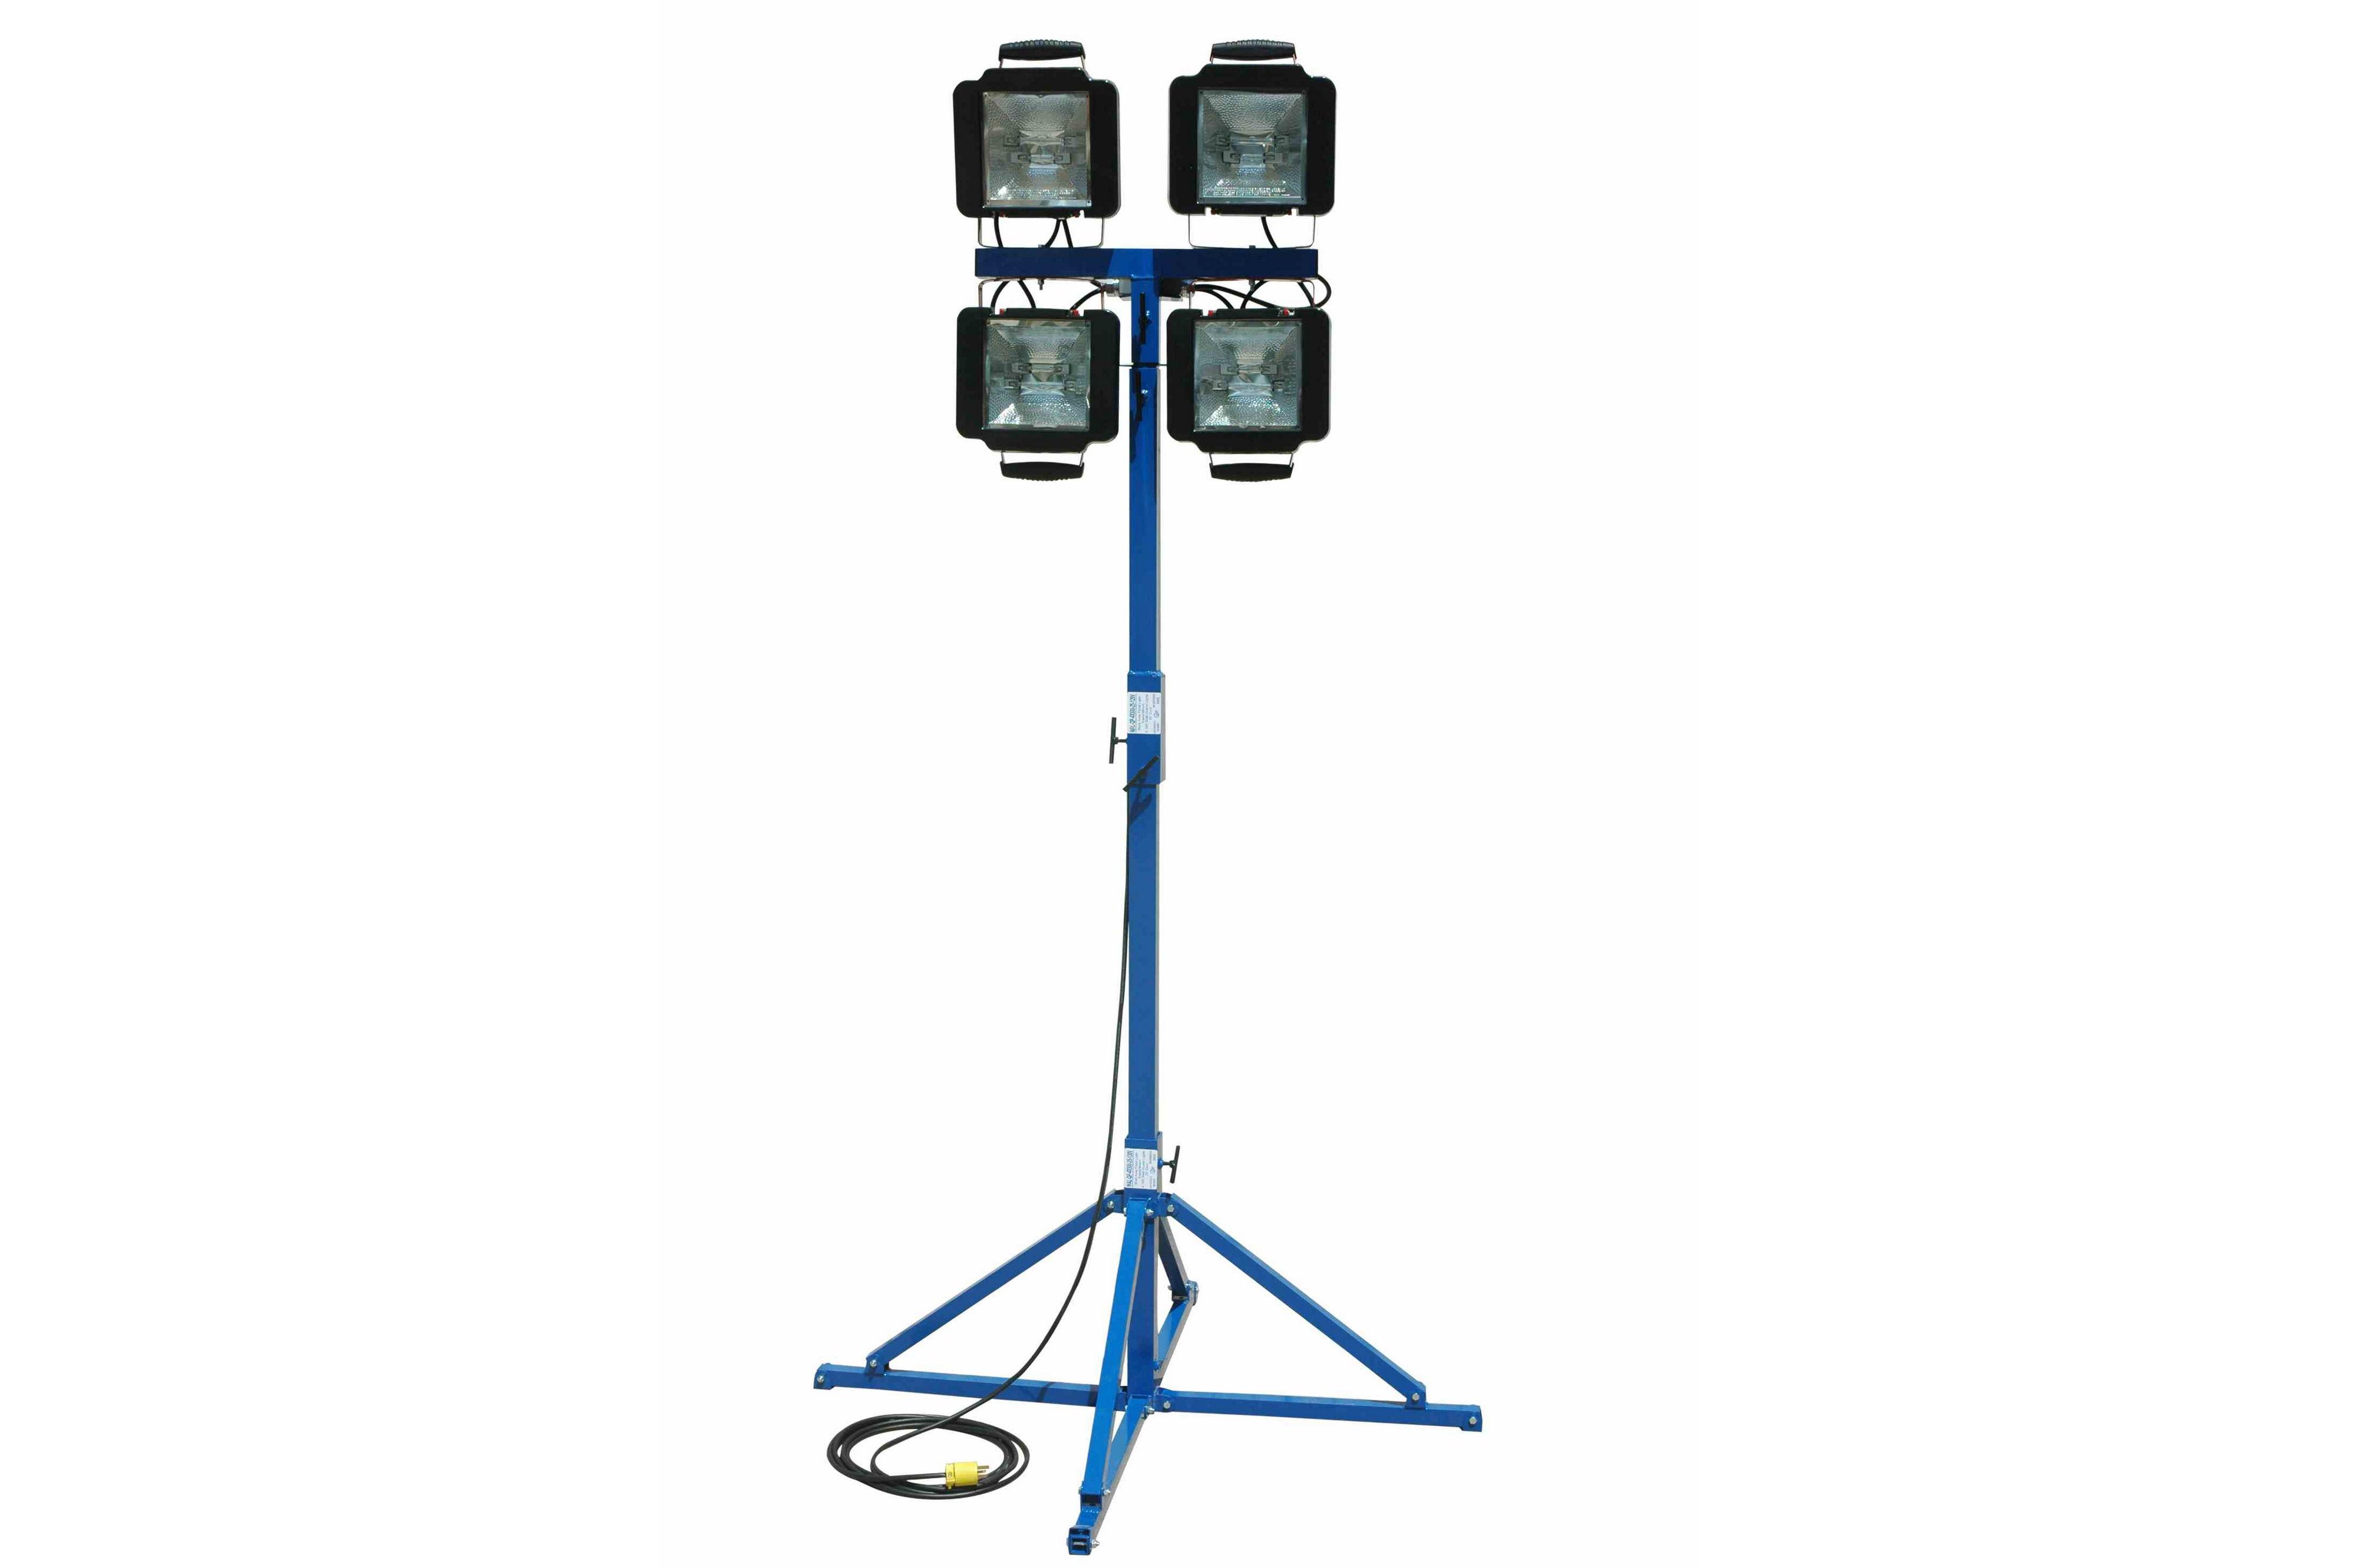 Portable Work Area Flood Light Tower